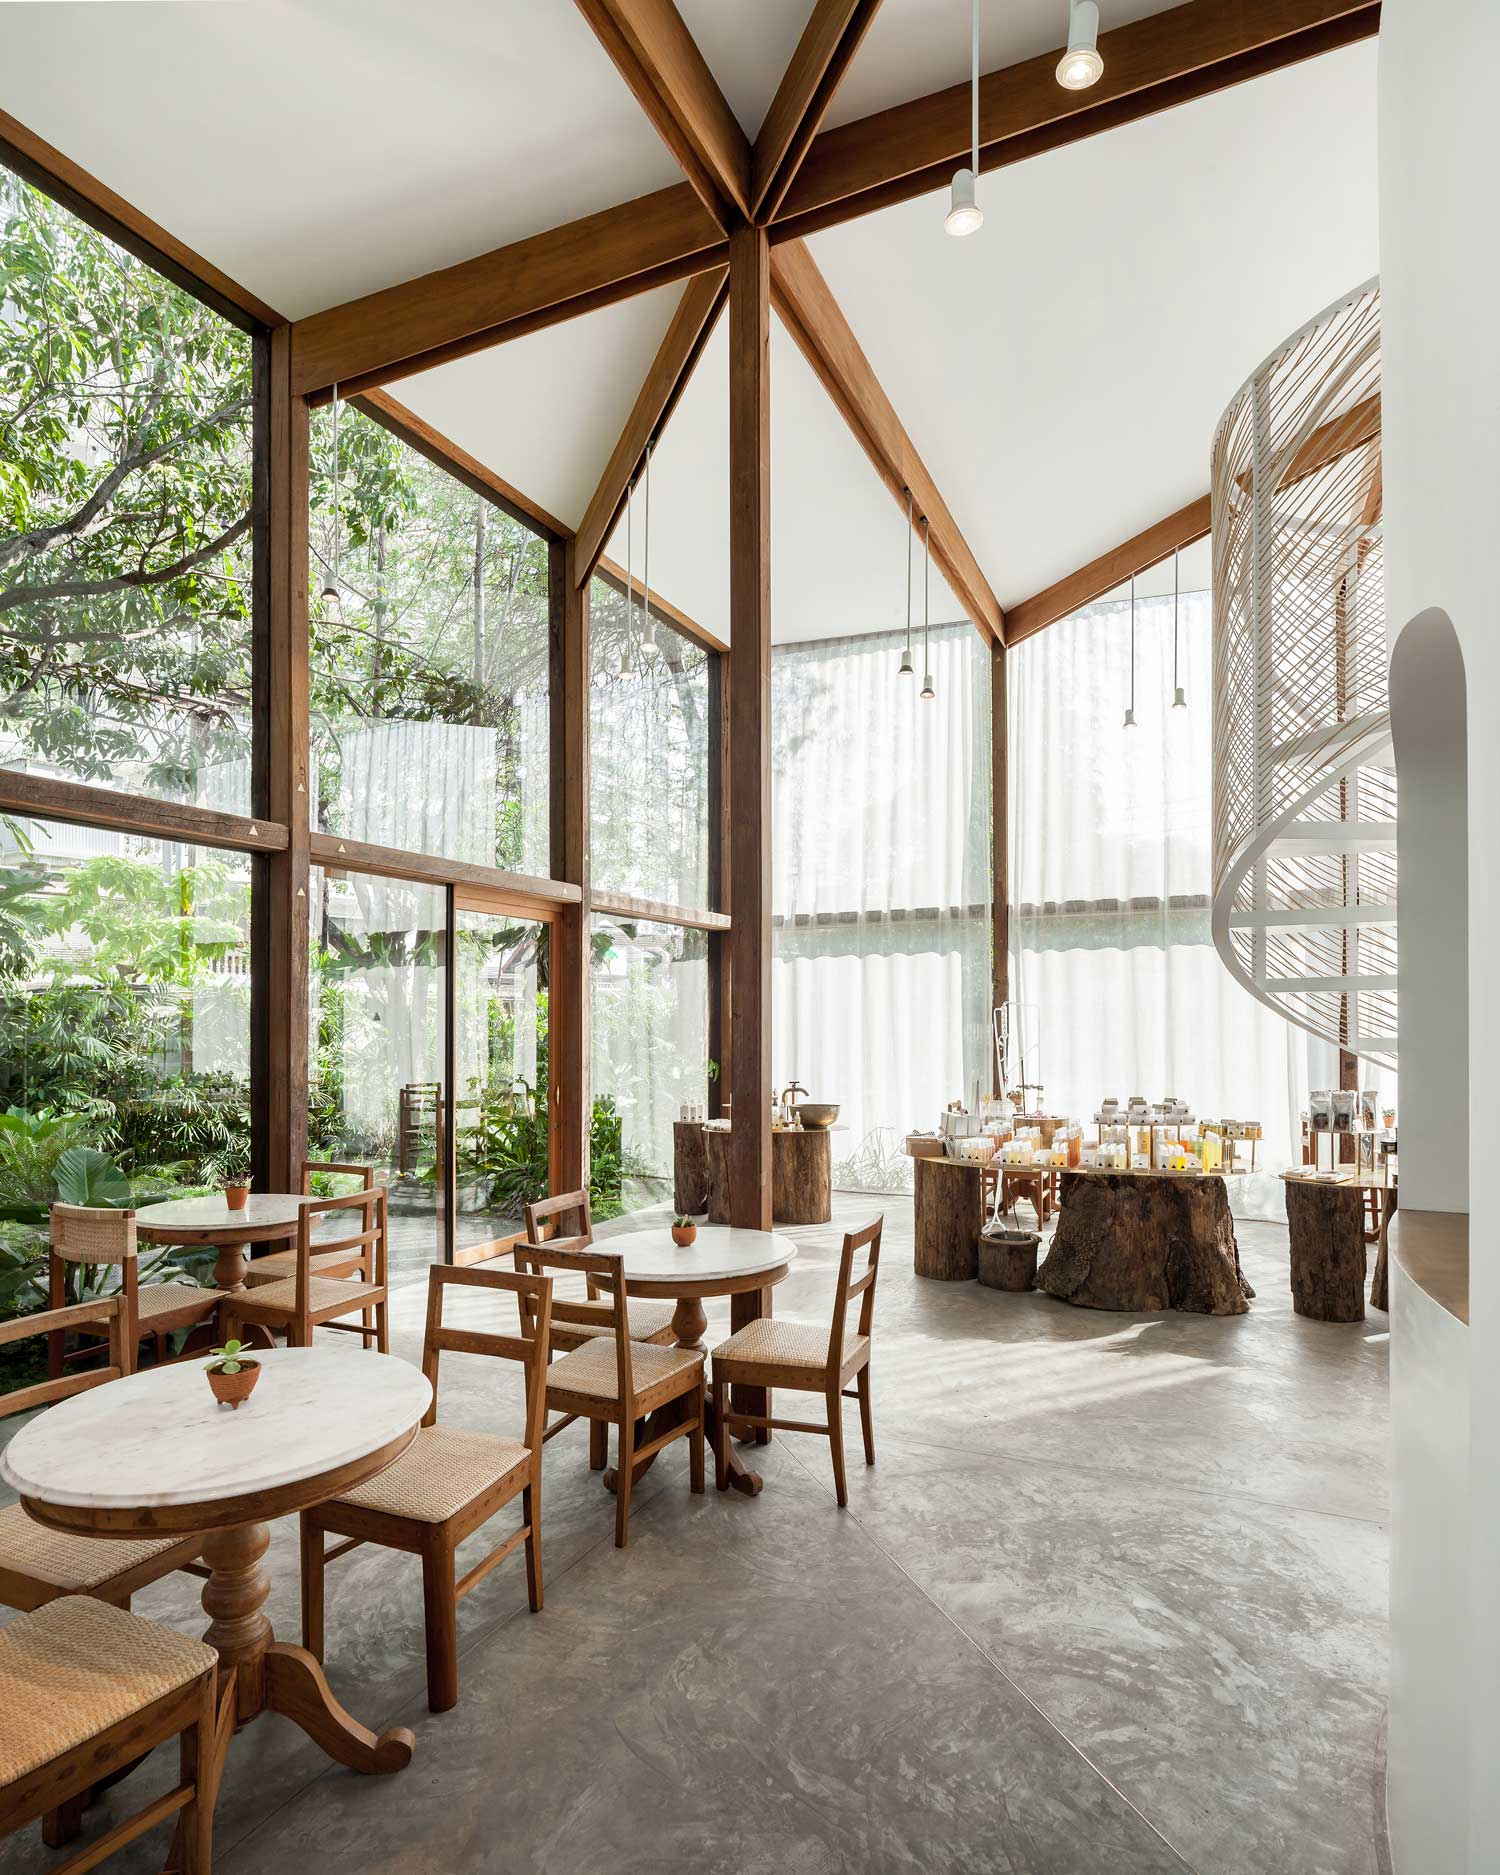 Patom Organic Living in Bangkok, Thailand by NITAPROW | Yellowtrace